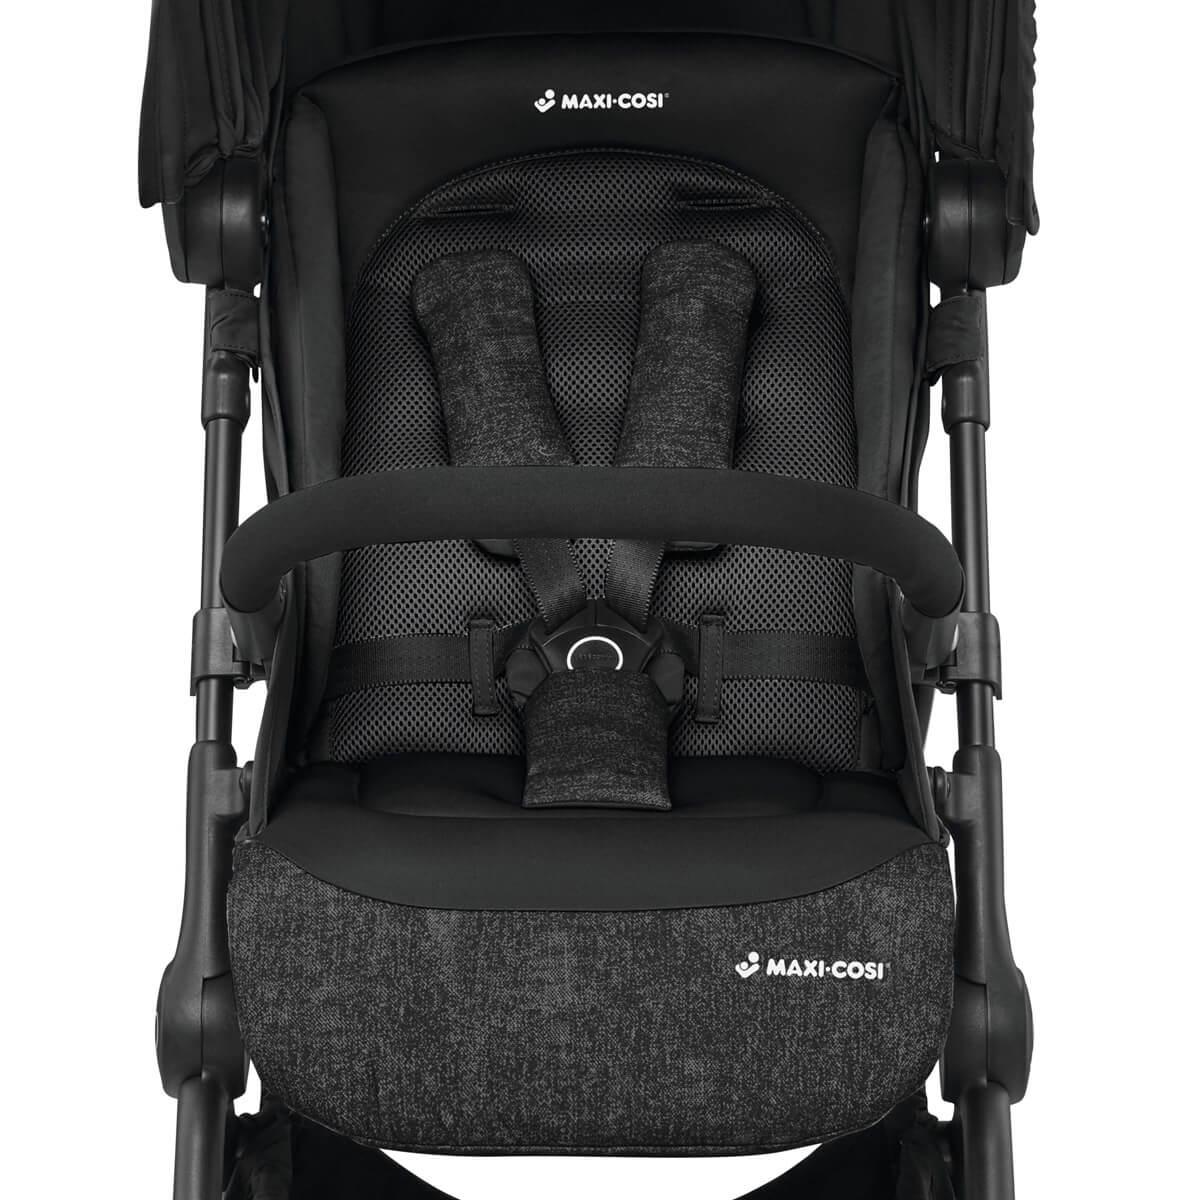 The Maxi-Cosi Lara strollers seat mesh fabrics help baby regulate its temperature